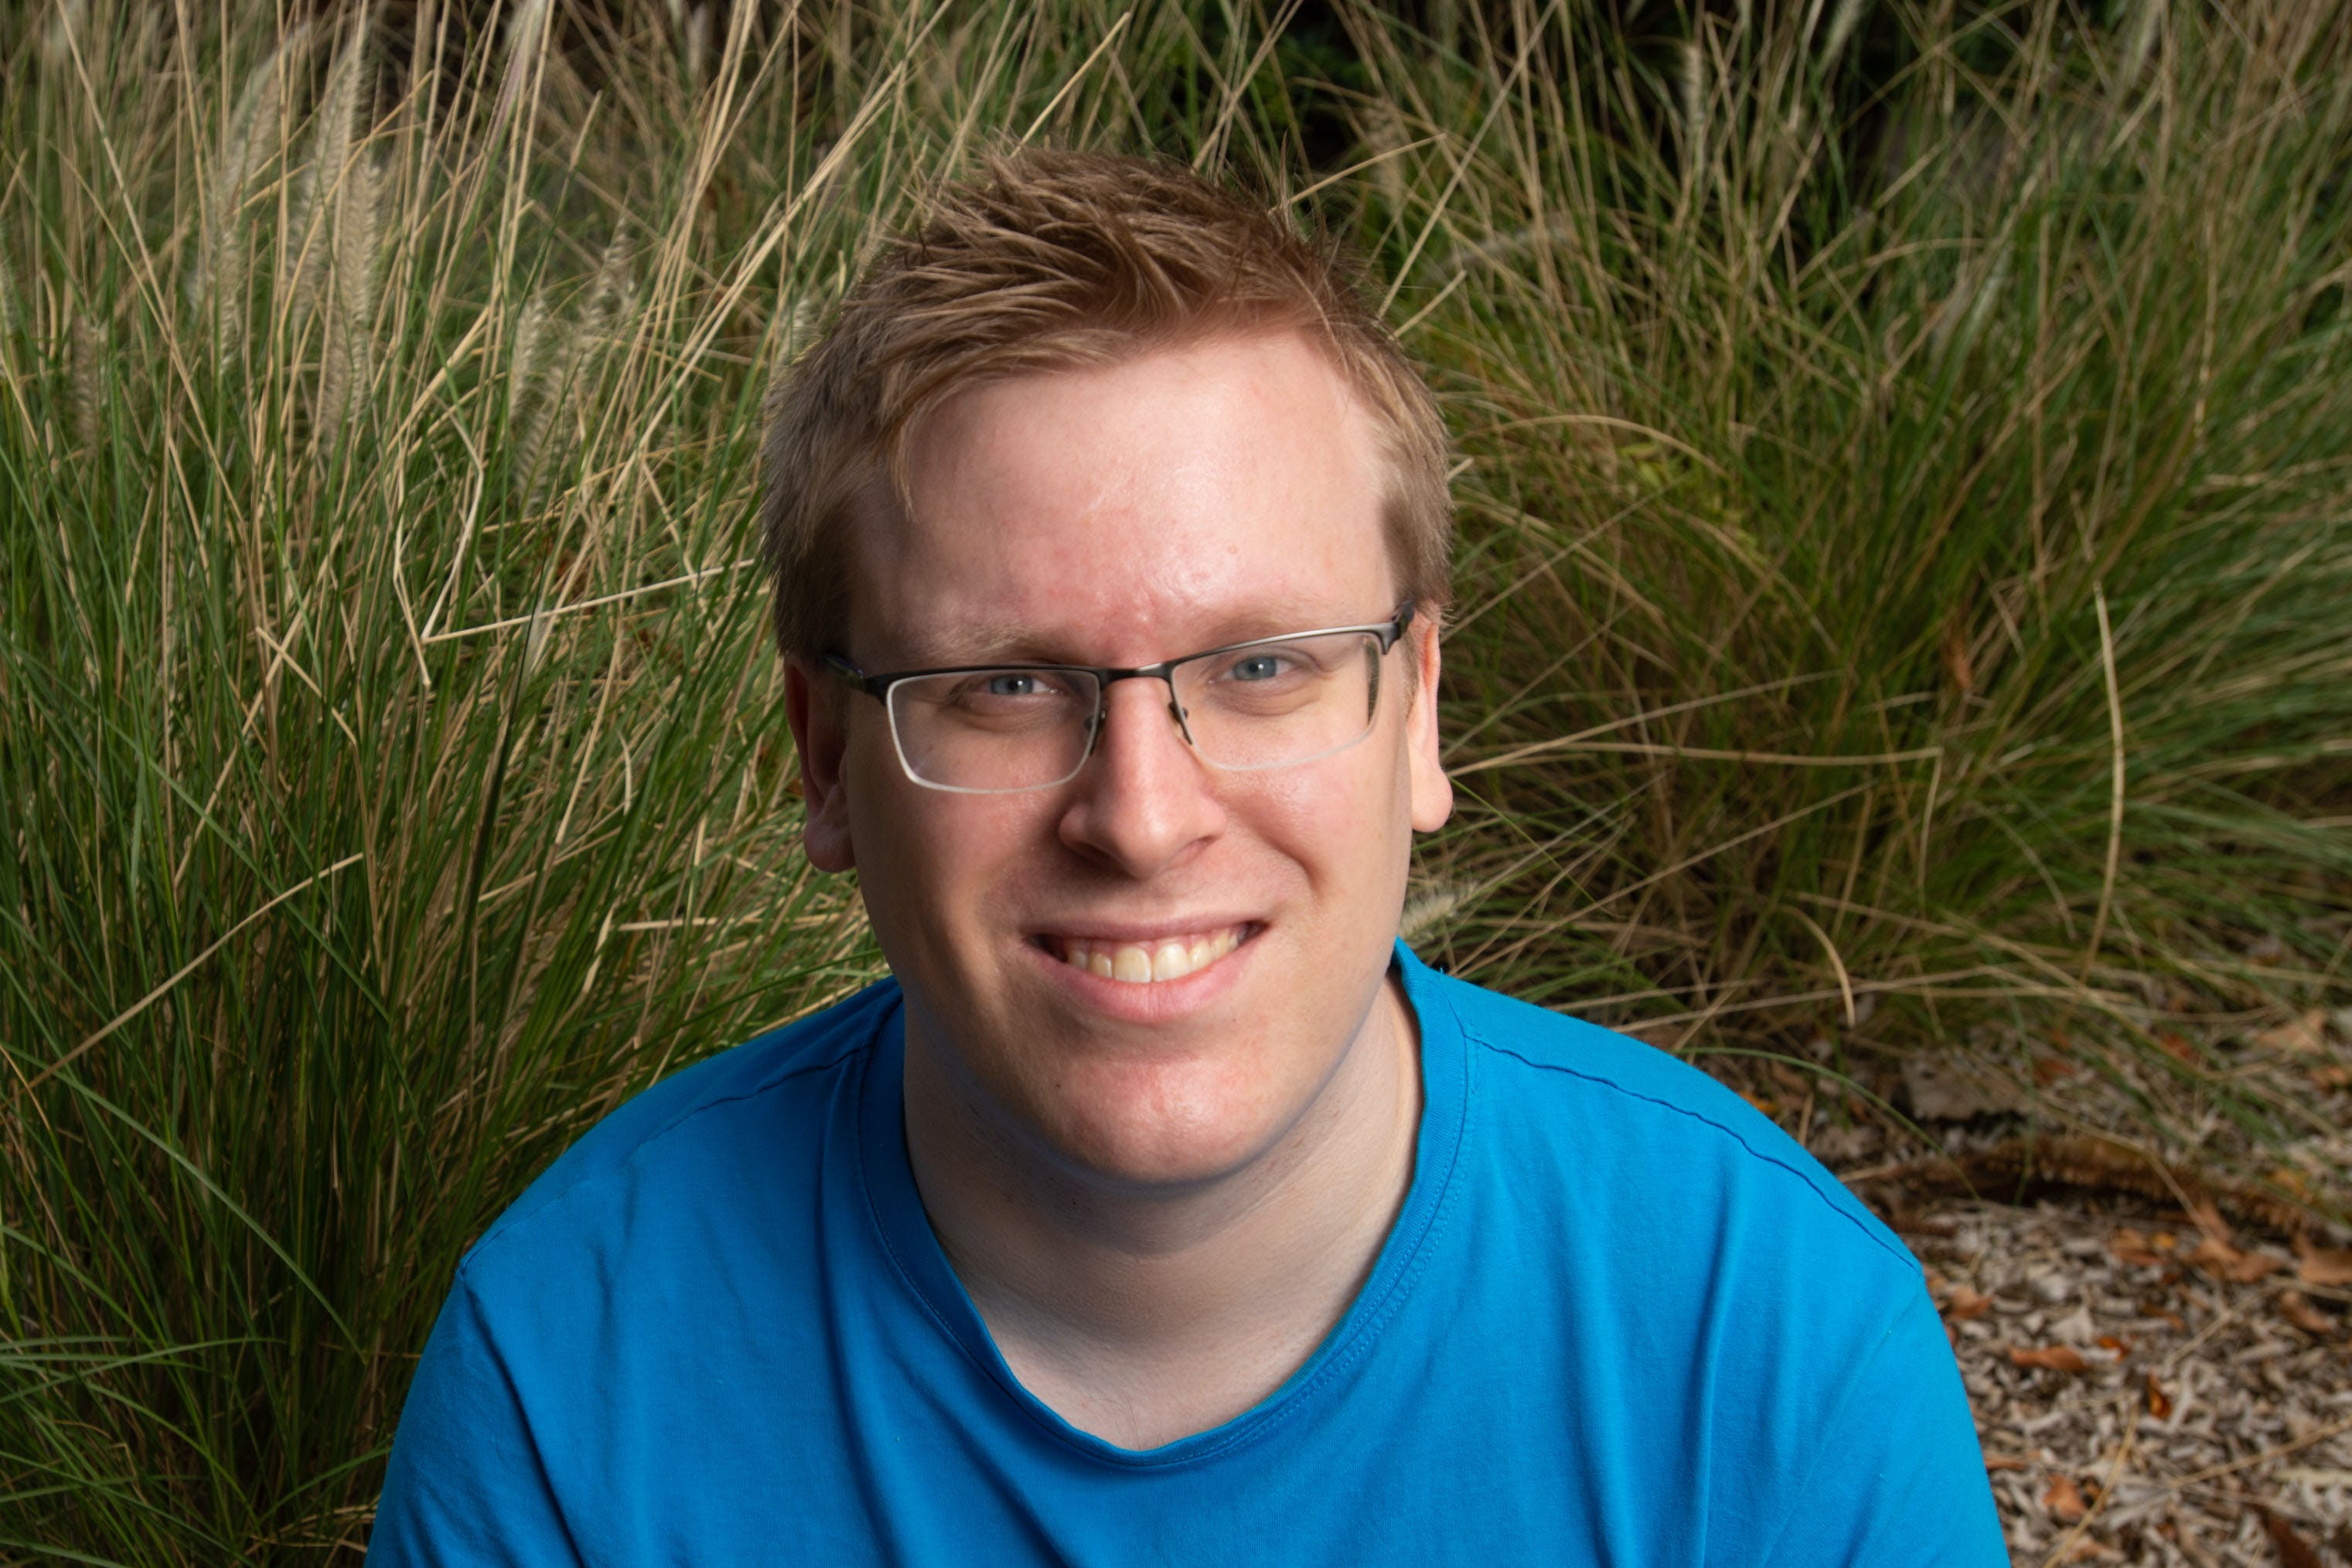 Fulbright Scholar's Mission Field Reaches Australia